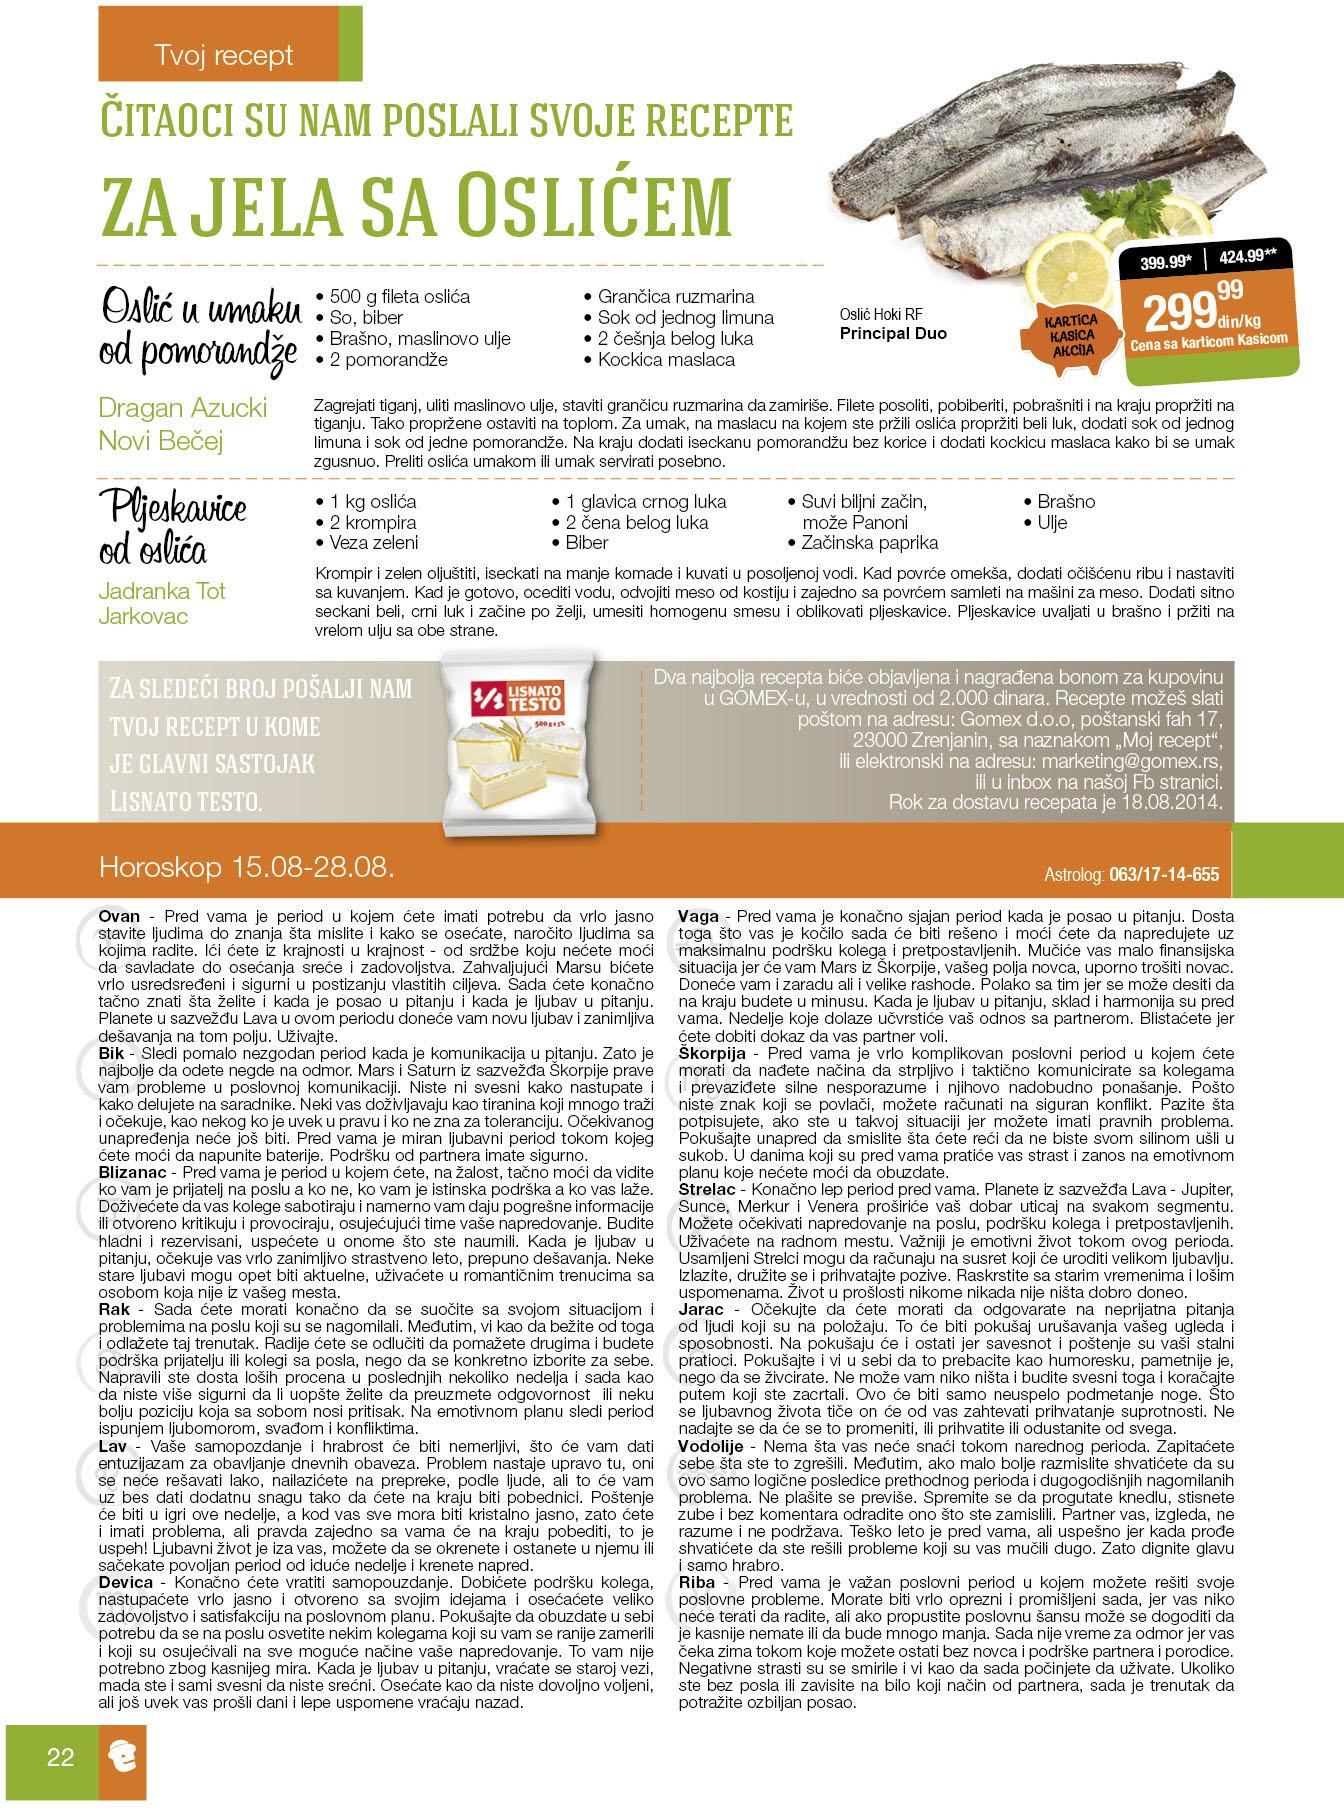 Gomex akcija prodični magazin super cena